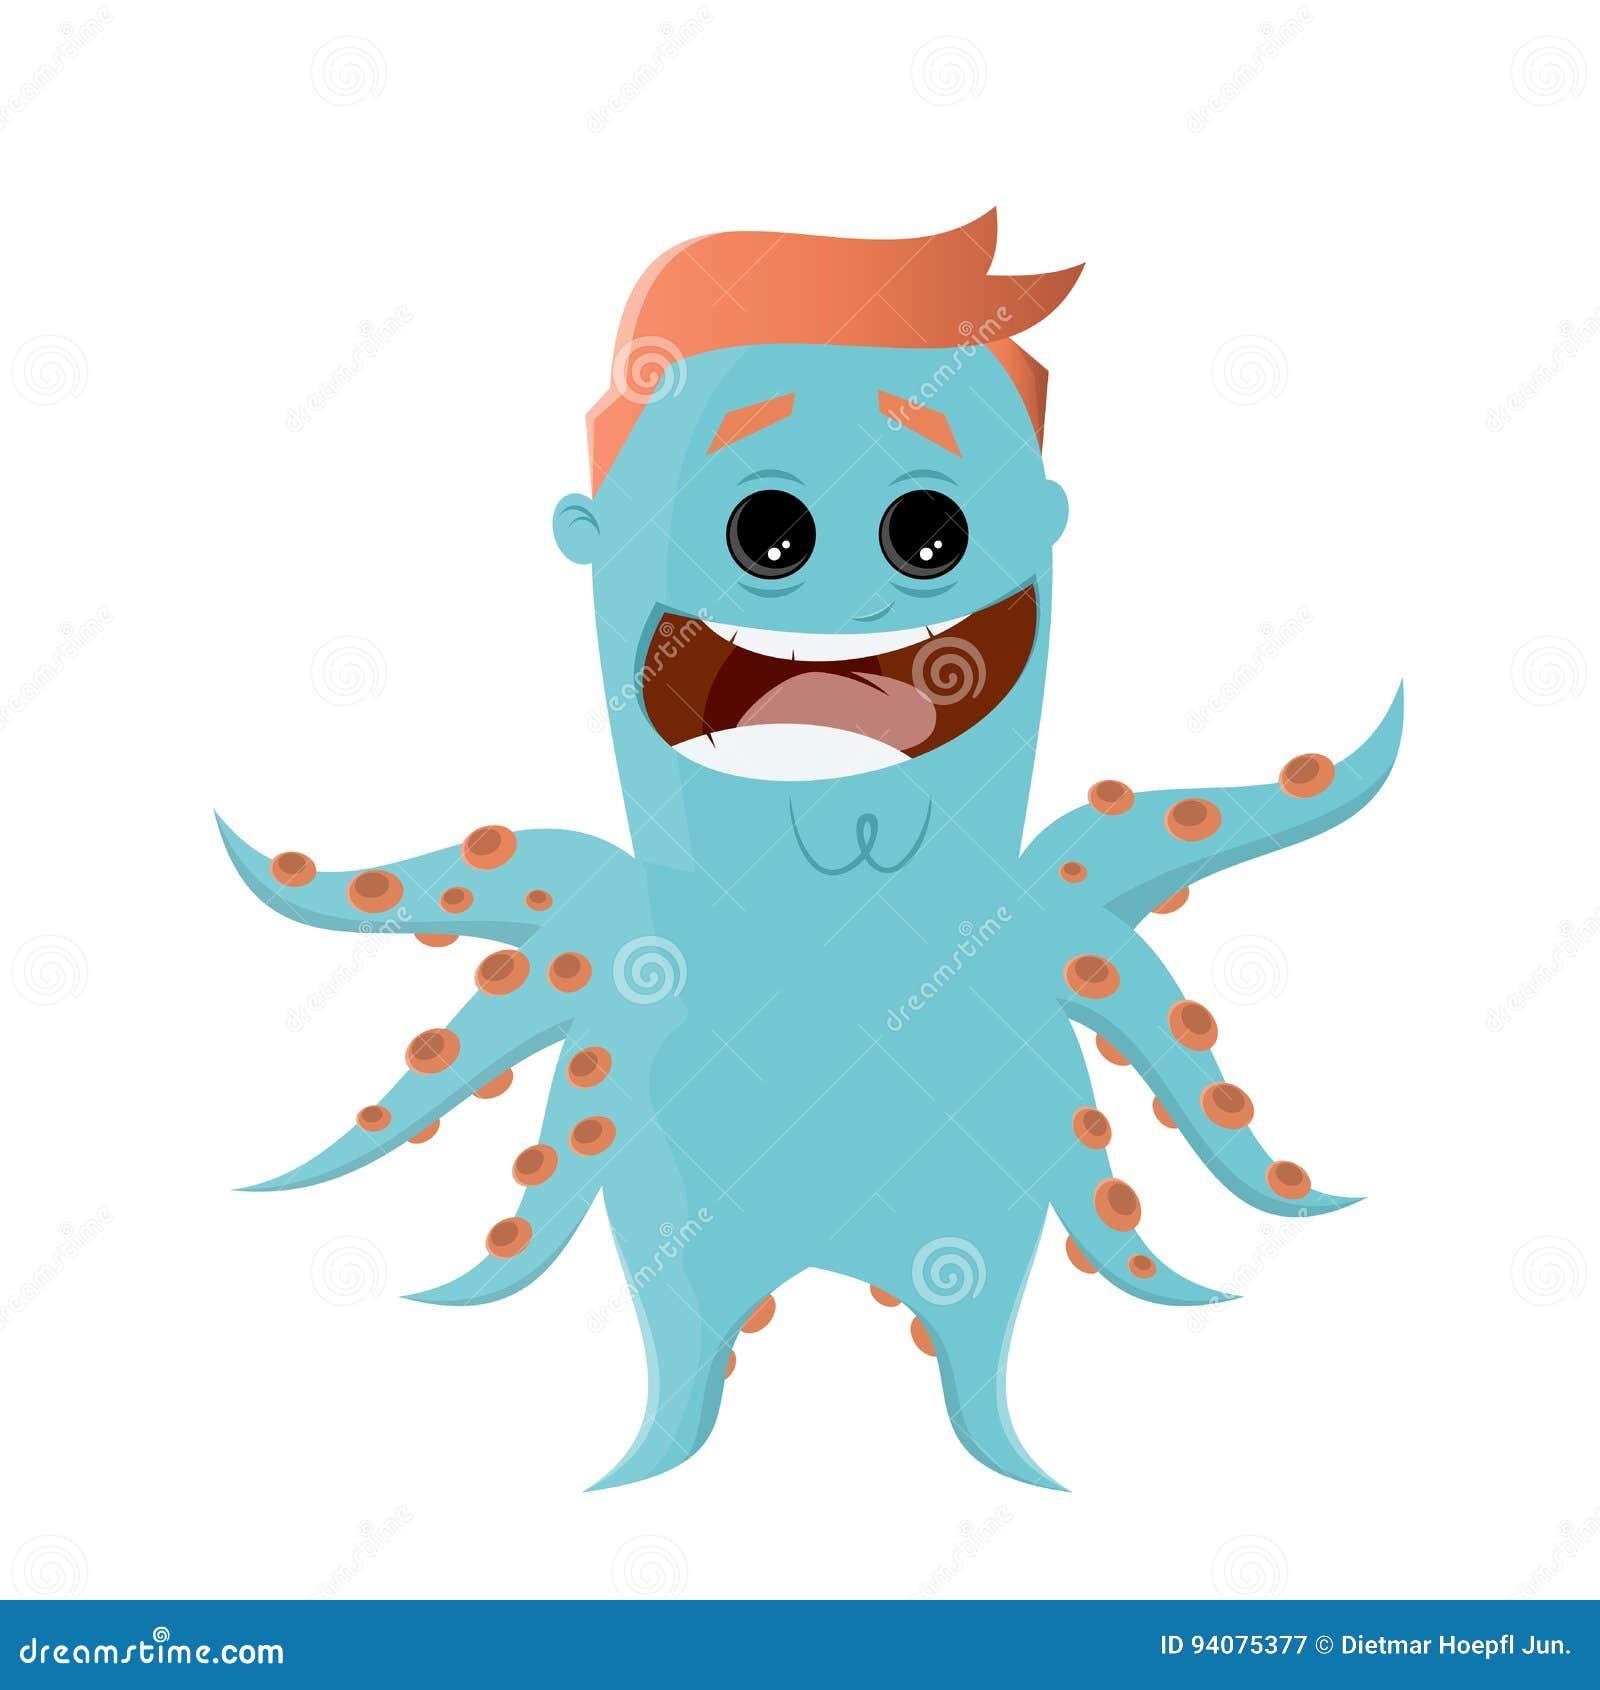 Blue Octopus Vector Clipart image - Free stock photo - Public Domain photo  - CC0 Images